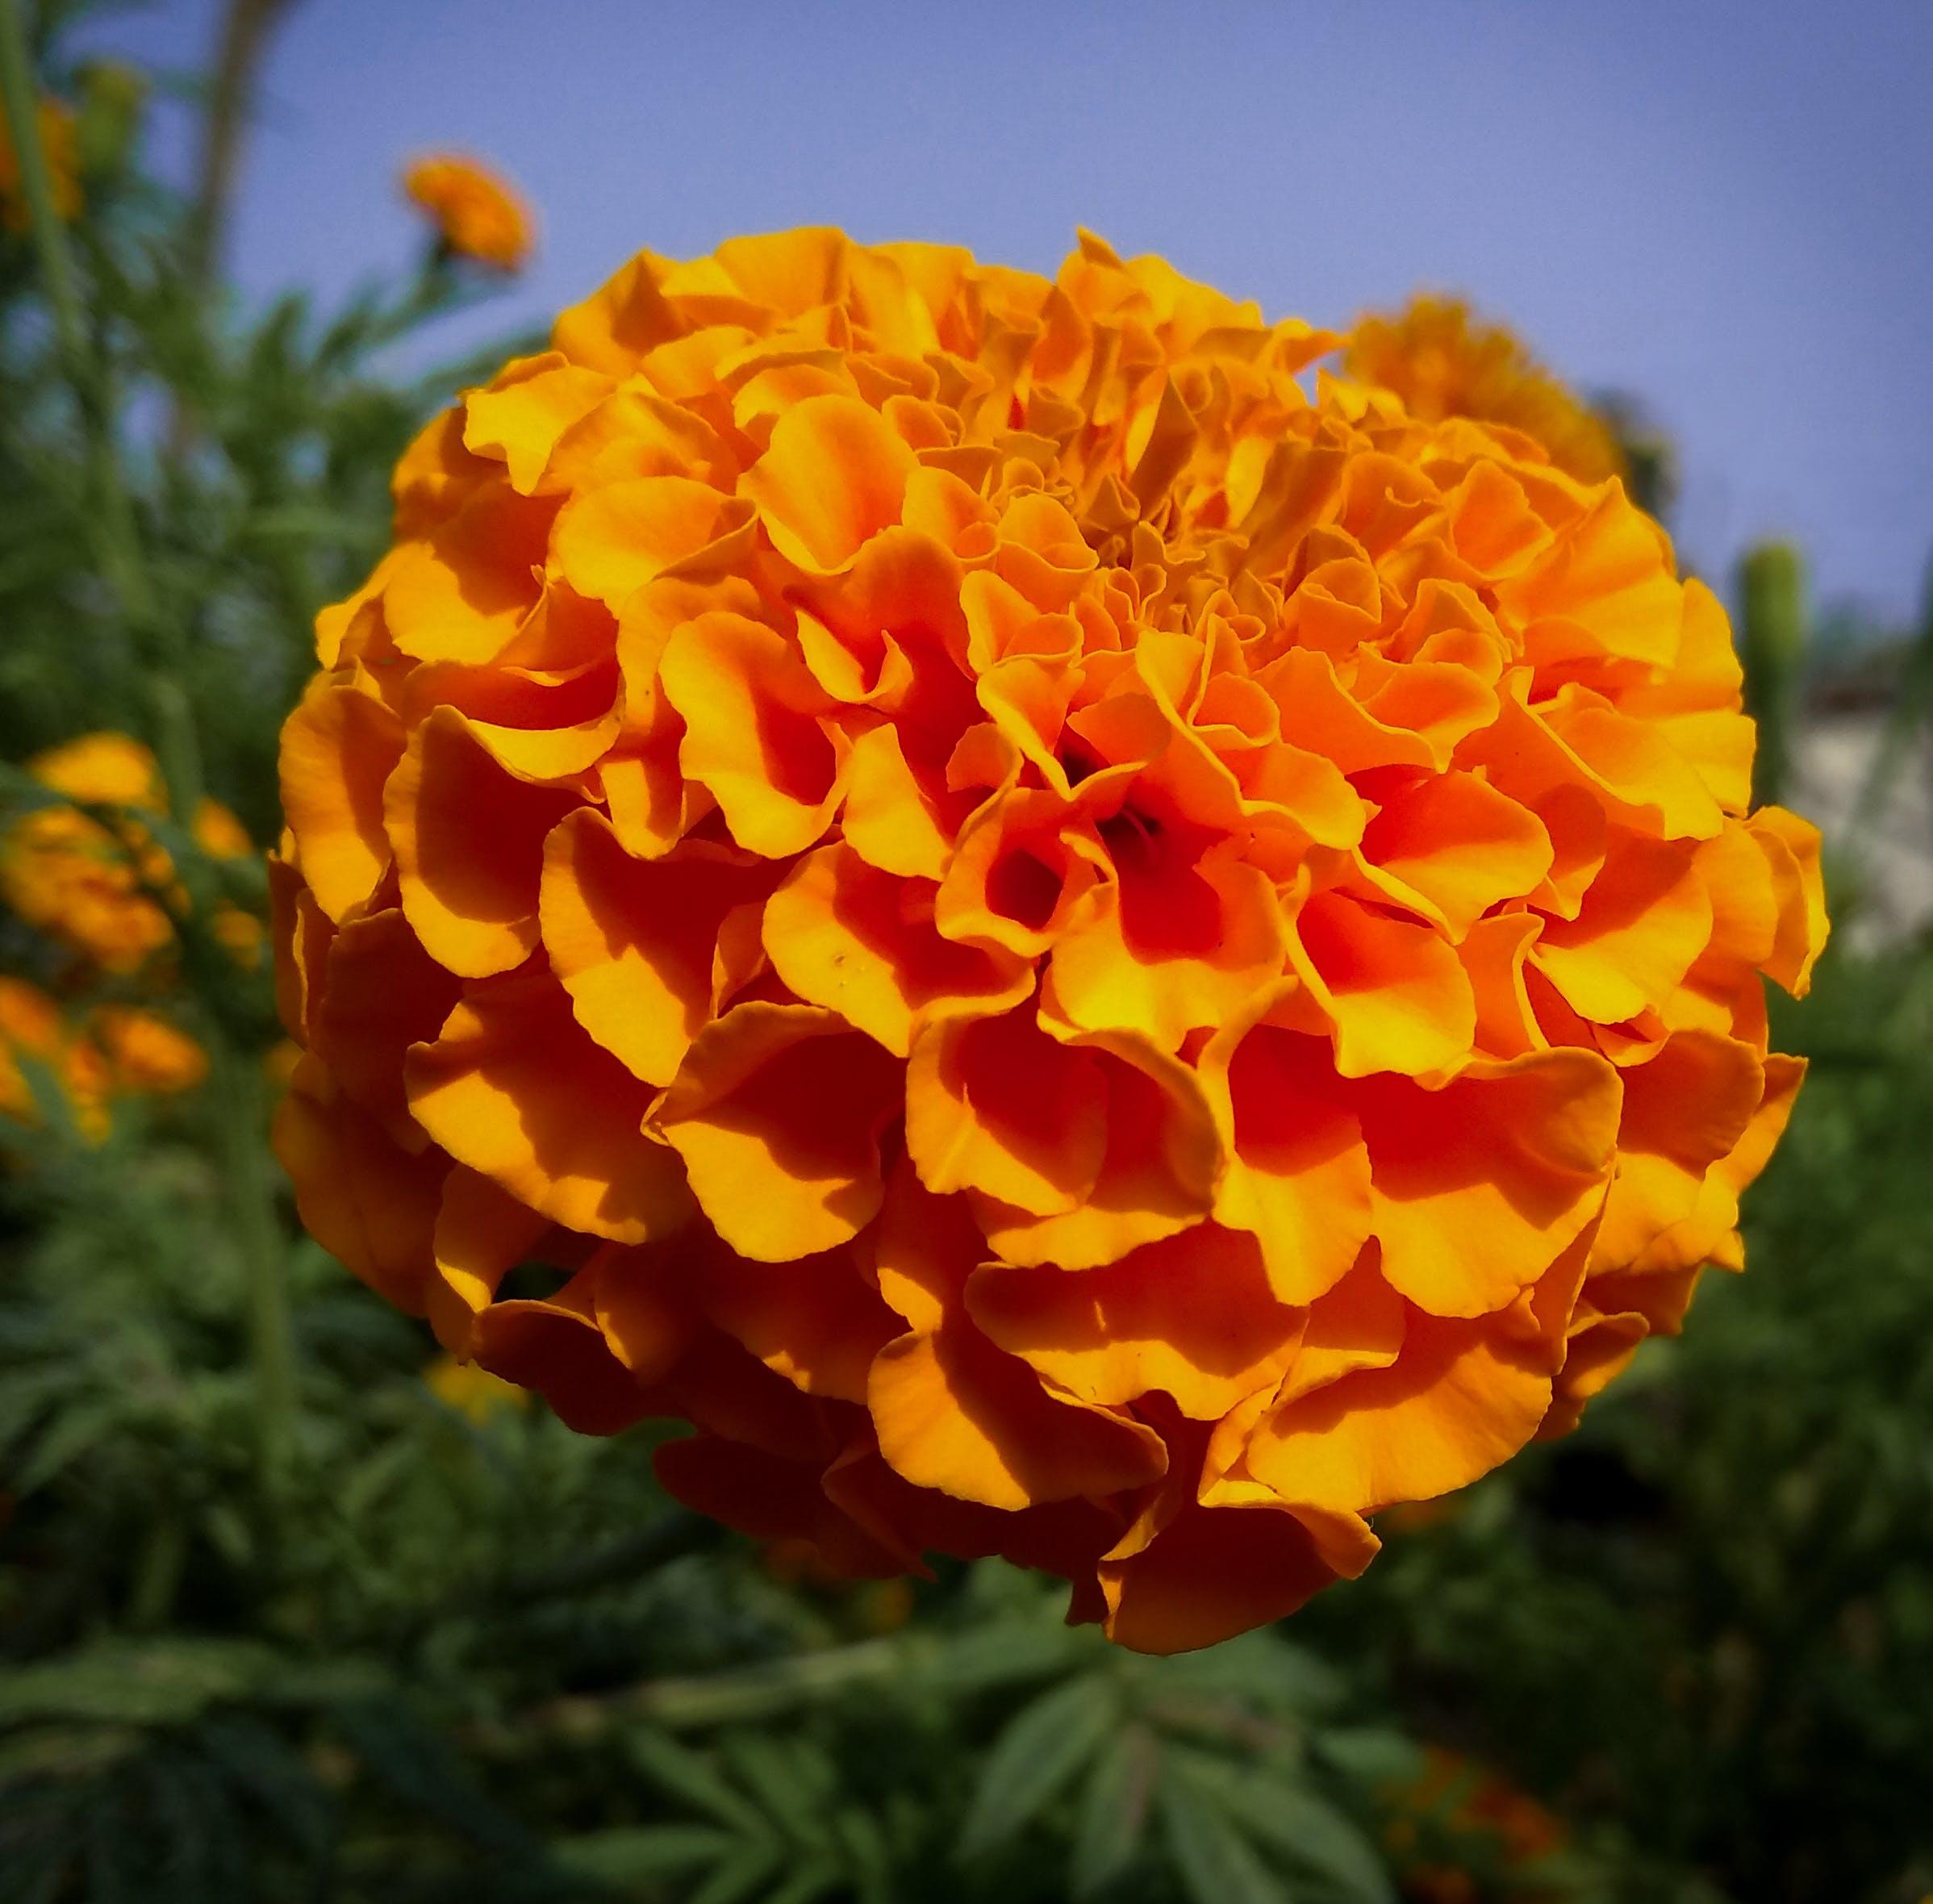 Free stock photo of bloom, blue sky, flower, focus